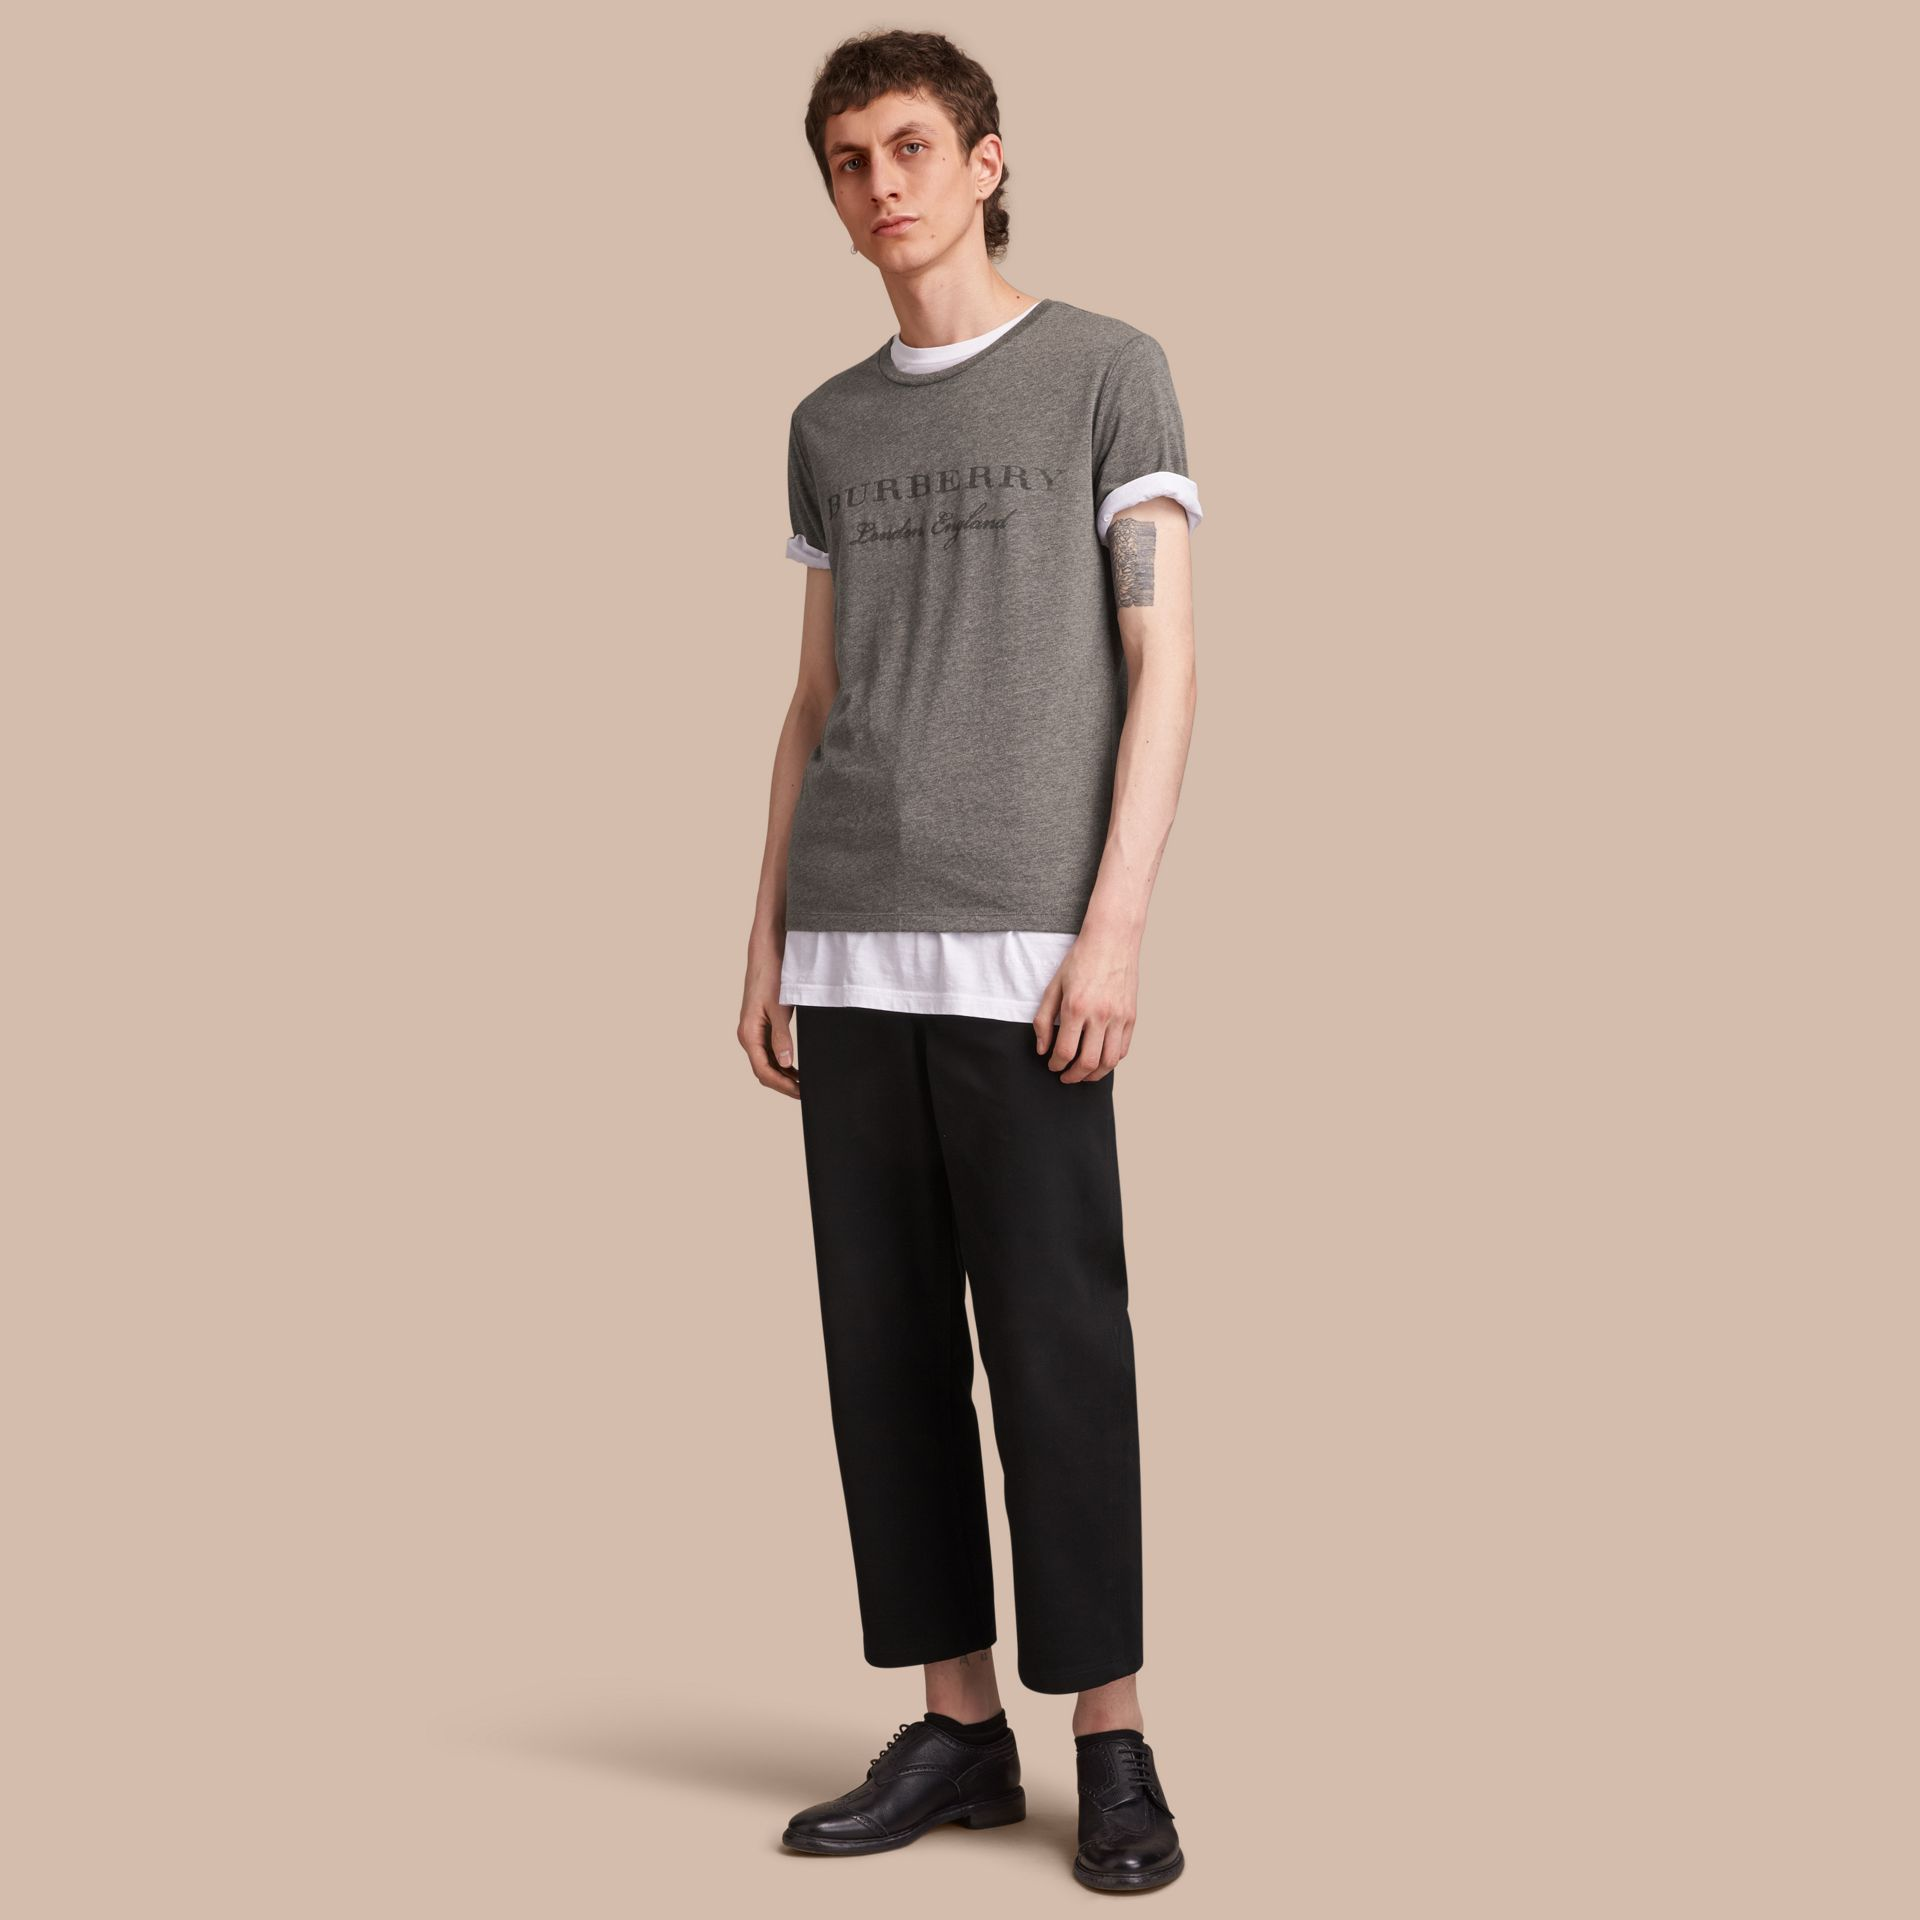 Contrast Motif Cotton Blend T-shirt Mid Grey Melange - gallery image 1